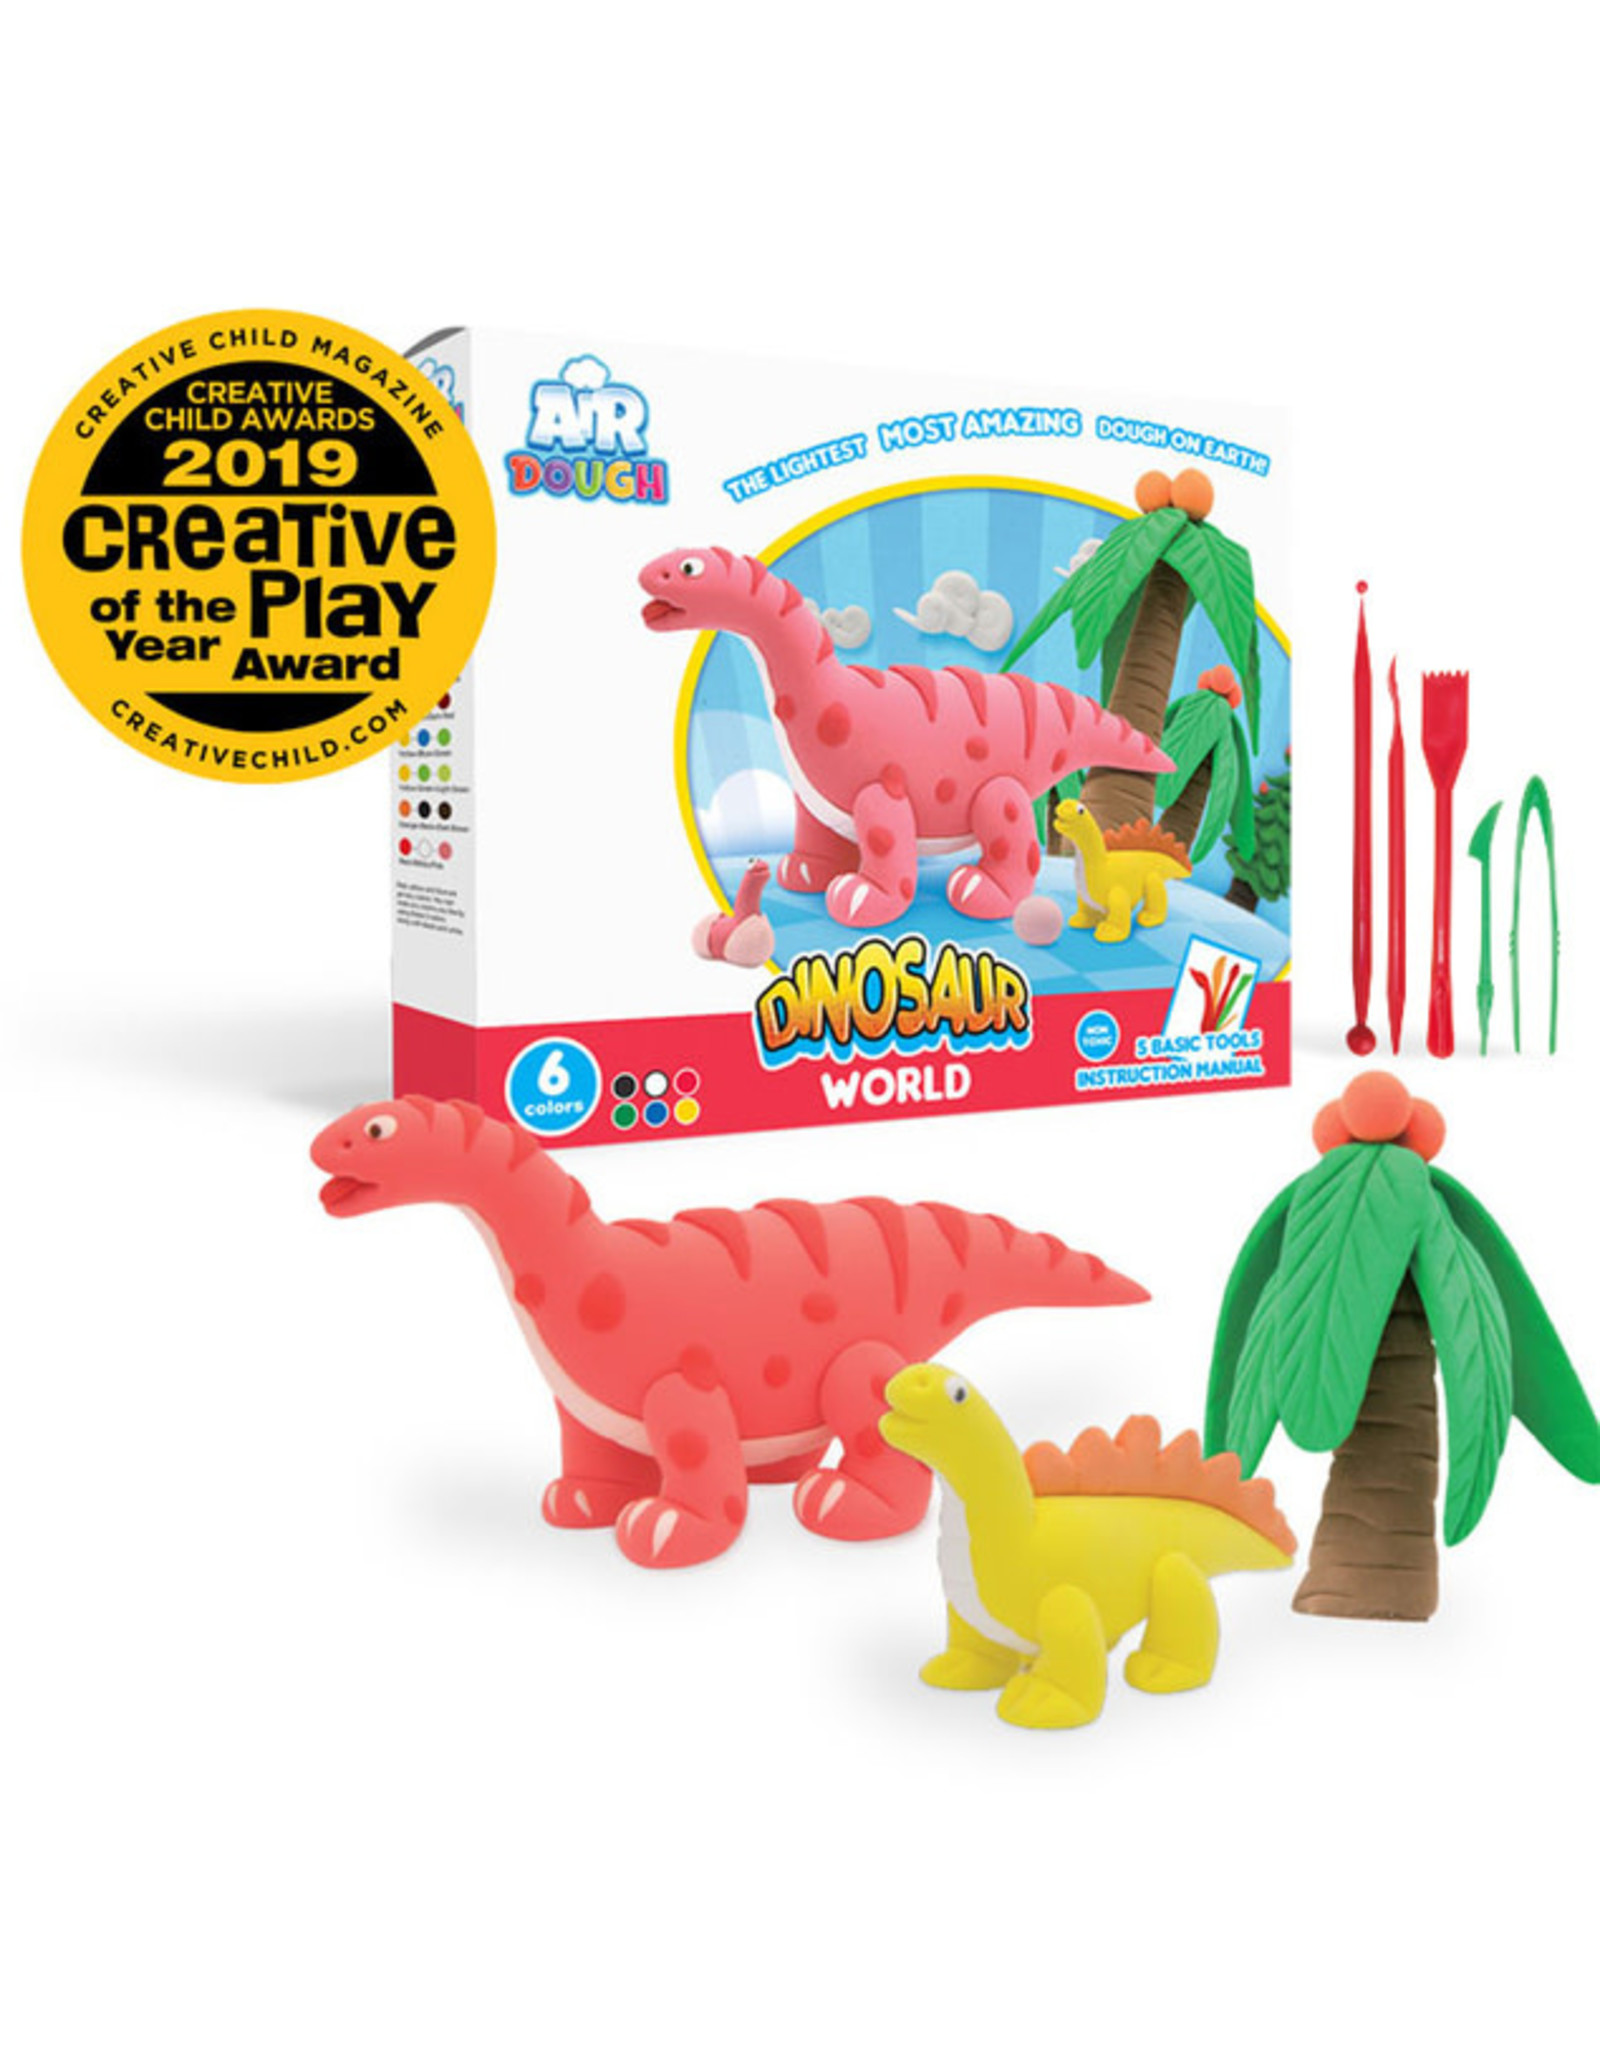 Air Dough - Dinosaur World